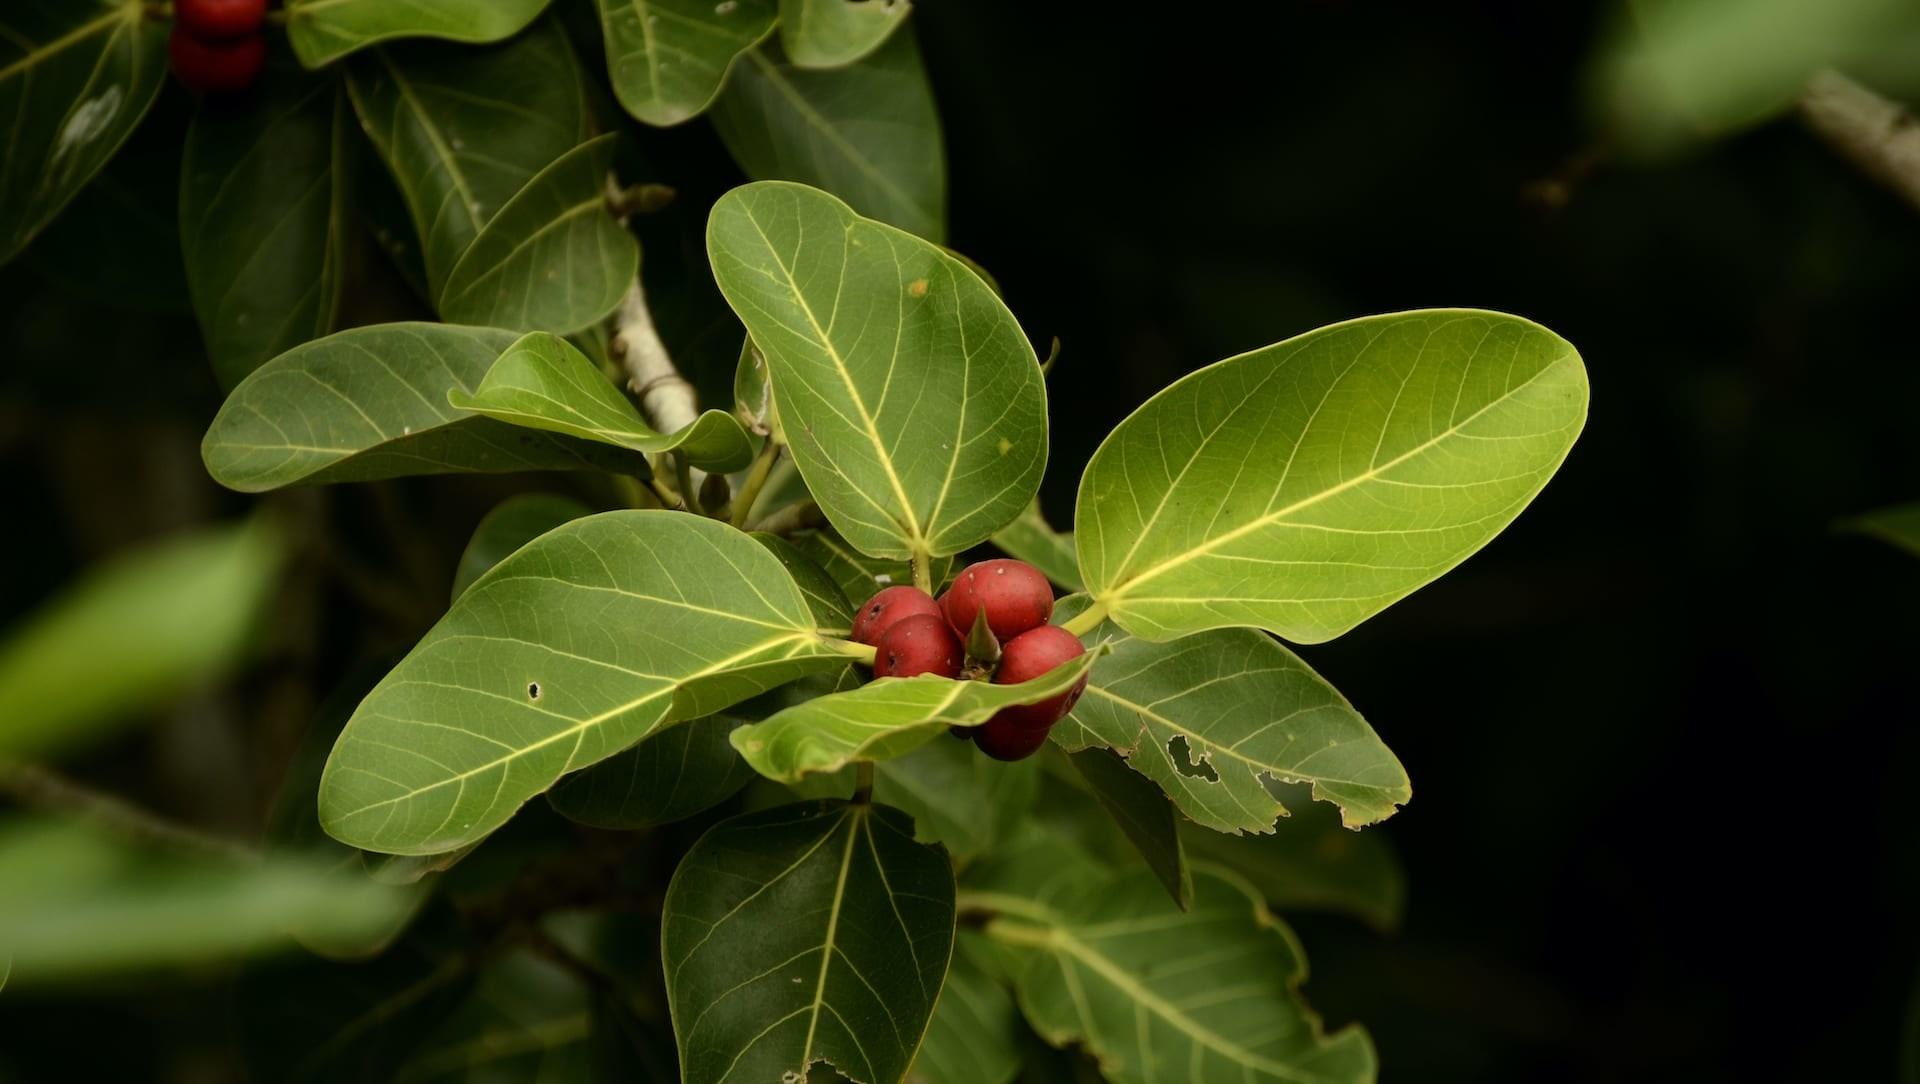 Cherish the Grove: A Foray into the Forests of the Coromandel Coast